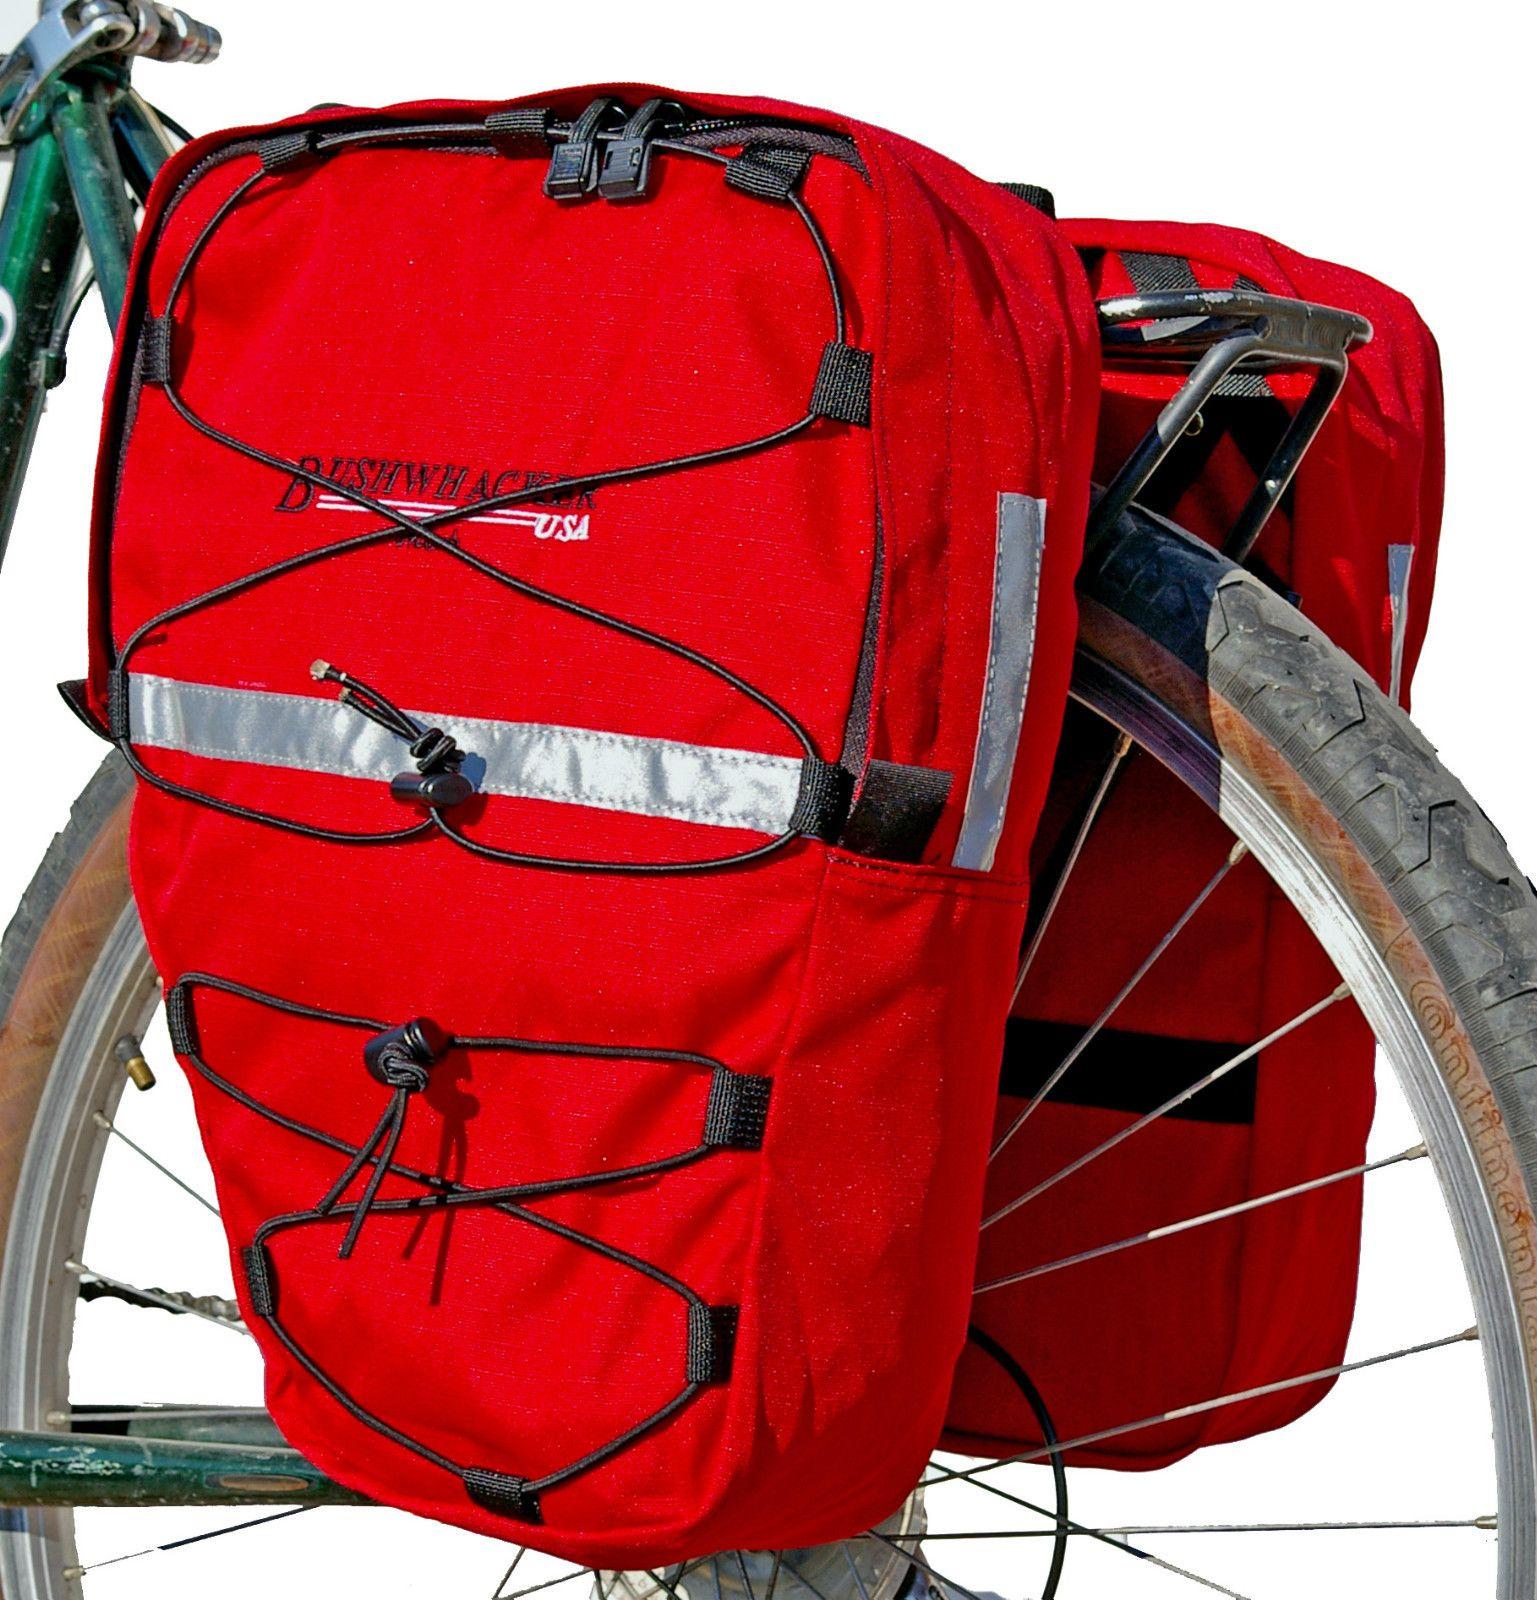 New Bushwhacker Moab Red Bike Pannier Bicycle Rack Cycling Cargo Bag ...